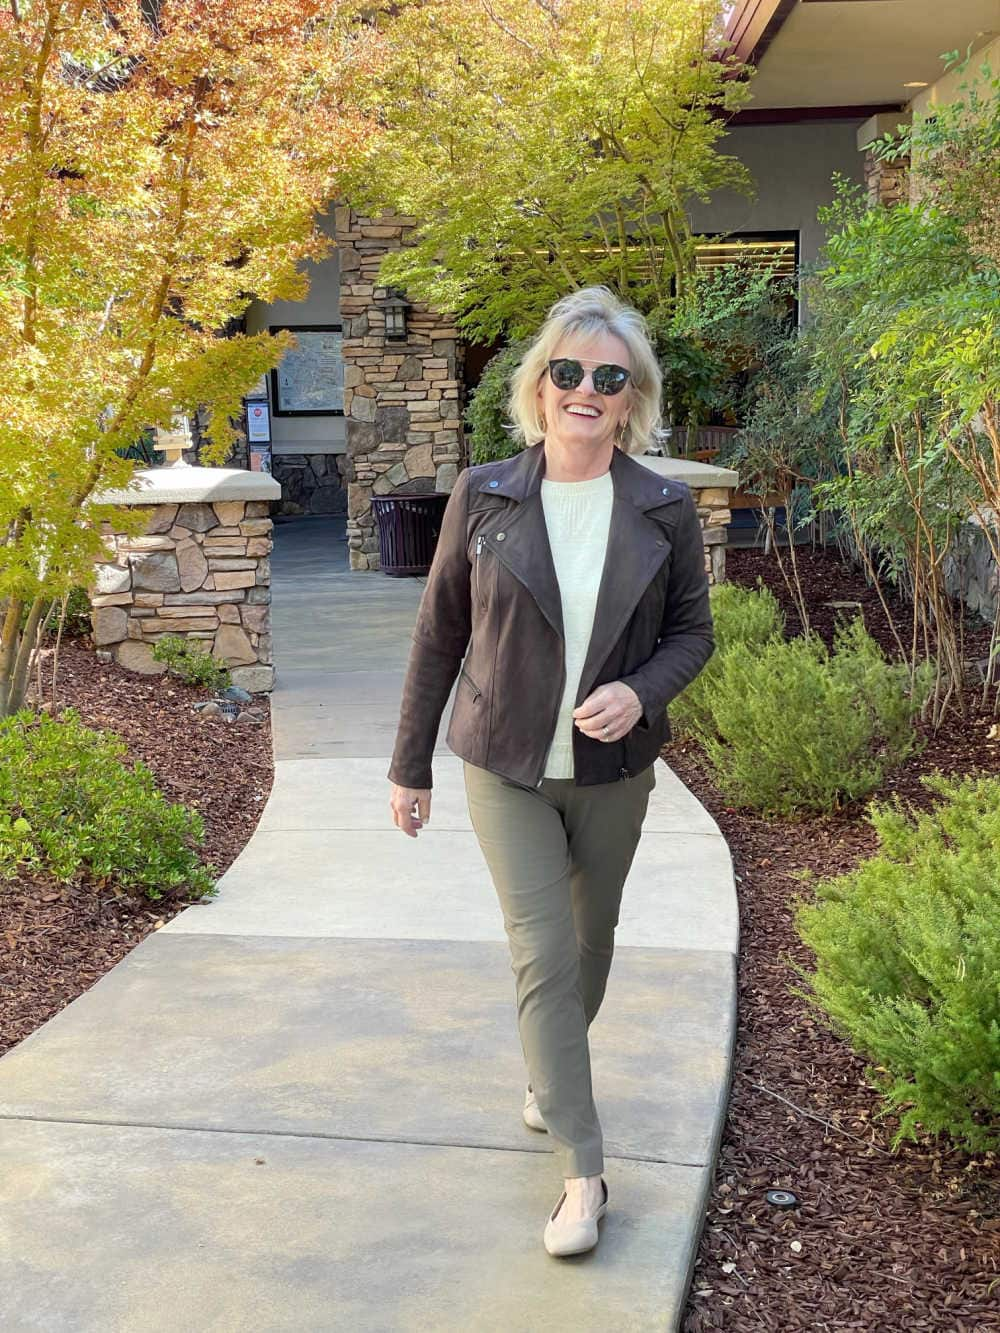 blonde woman walking wearing brown faux suede moto jacket outfit